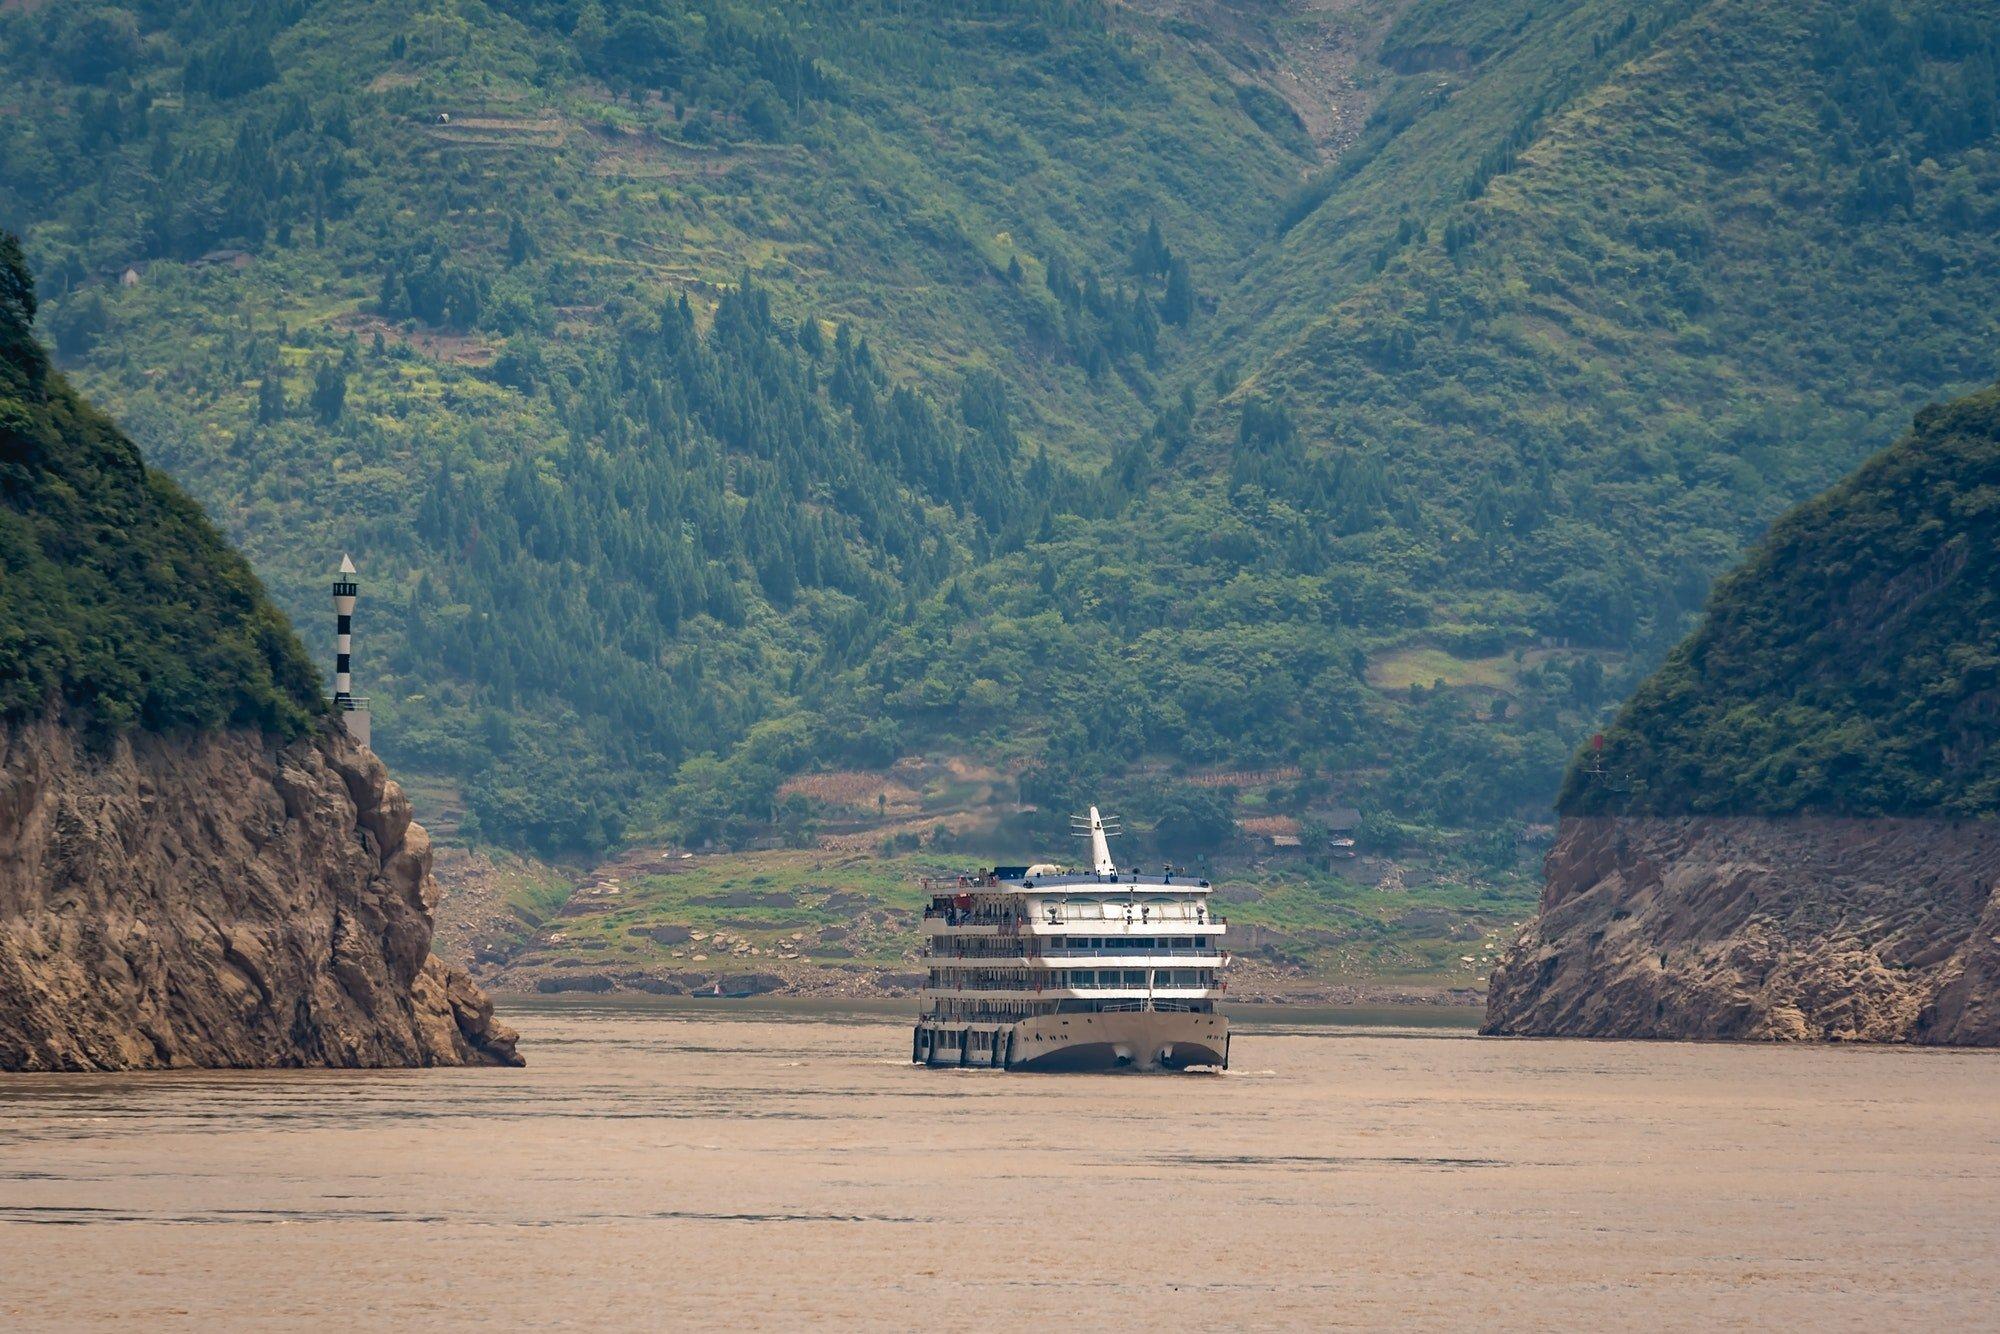 Luxury passenger cruise ship on Yangtze river